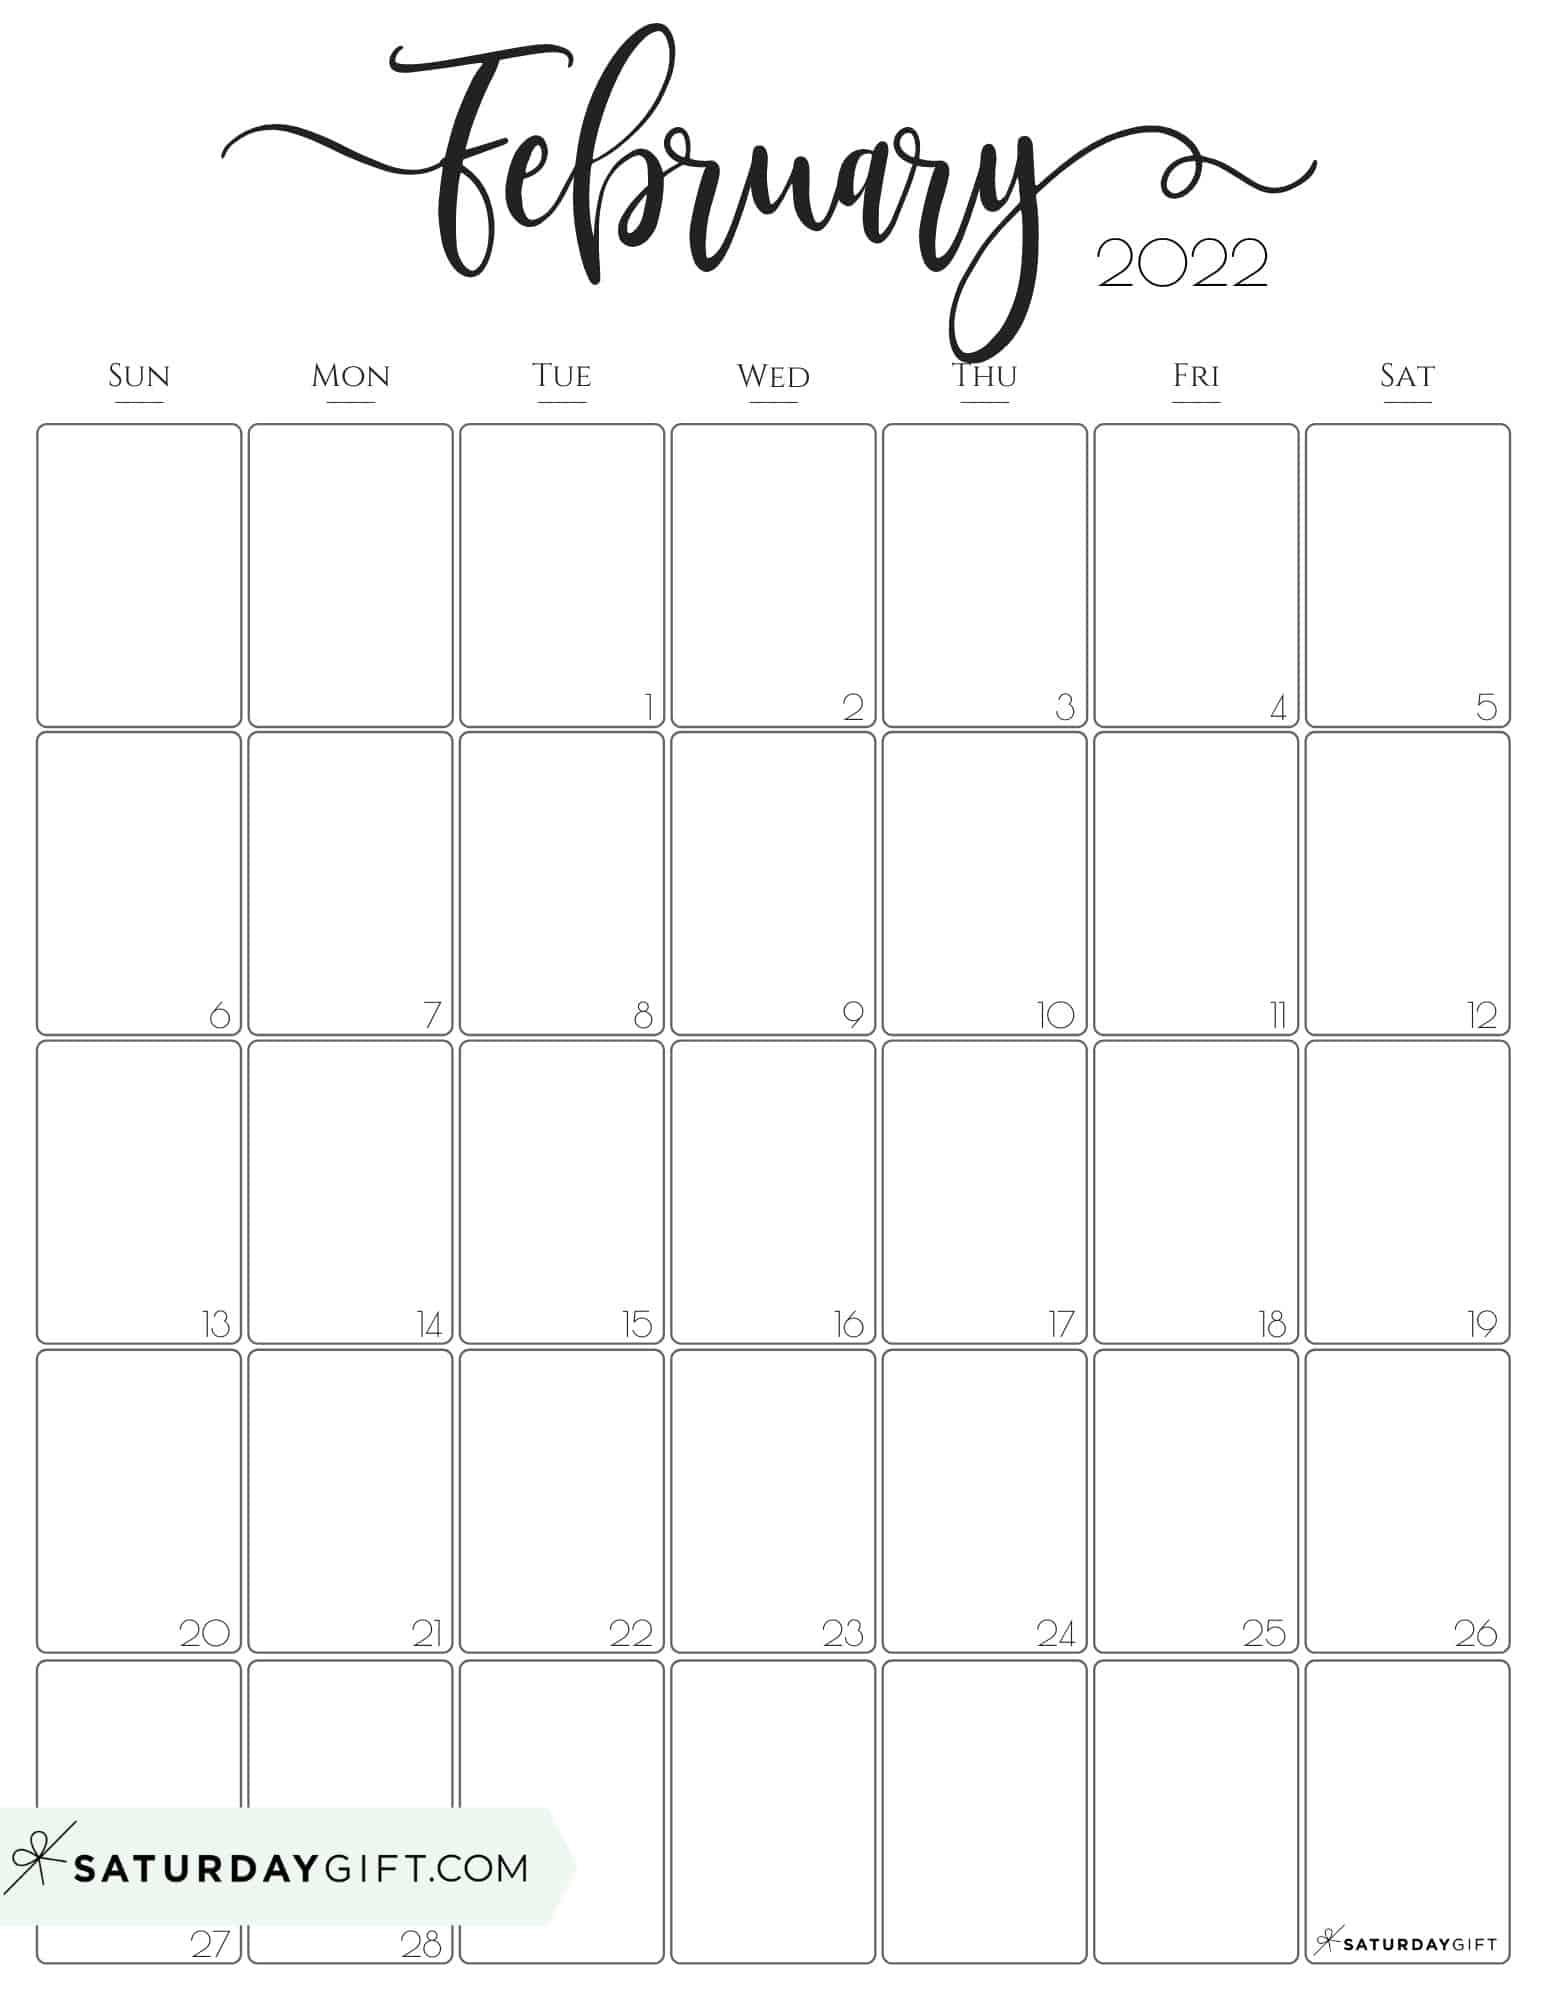 Cute (& Free!) Printable February 2022 Calendar   Saturdaygift Regarding February 2022 Calendar Monday Start